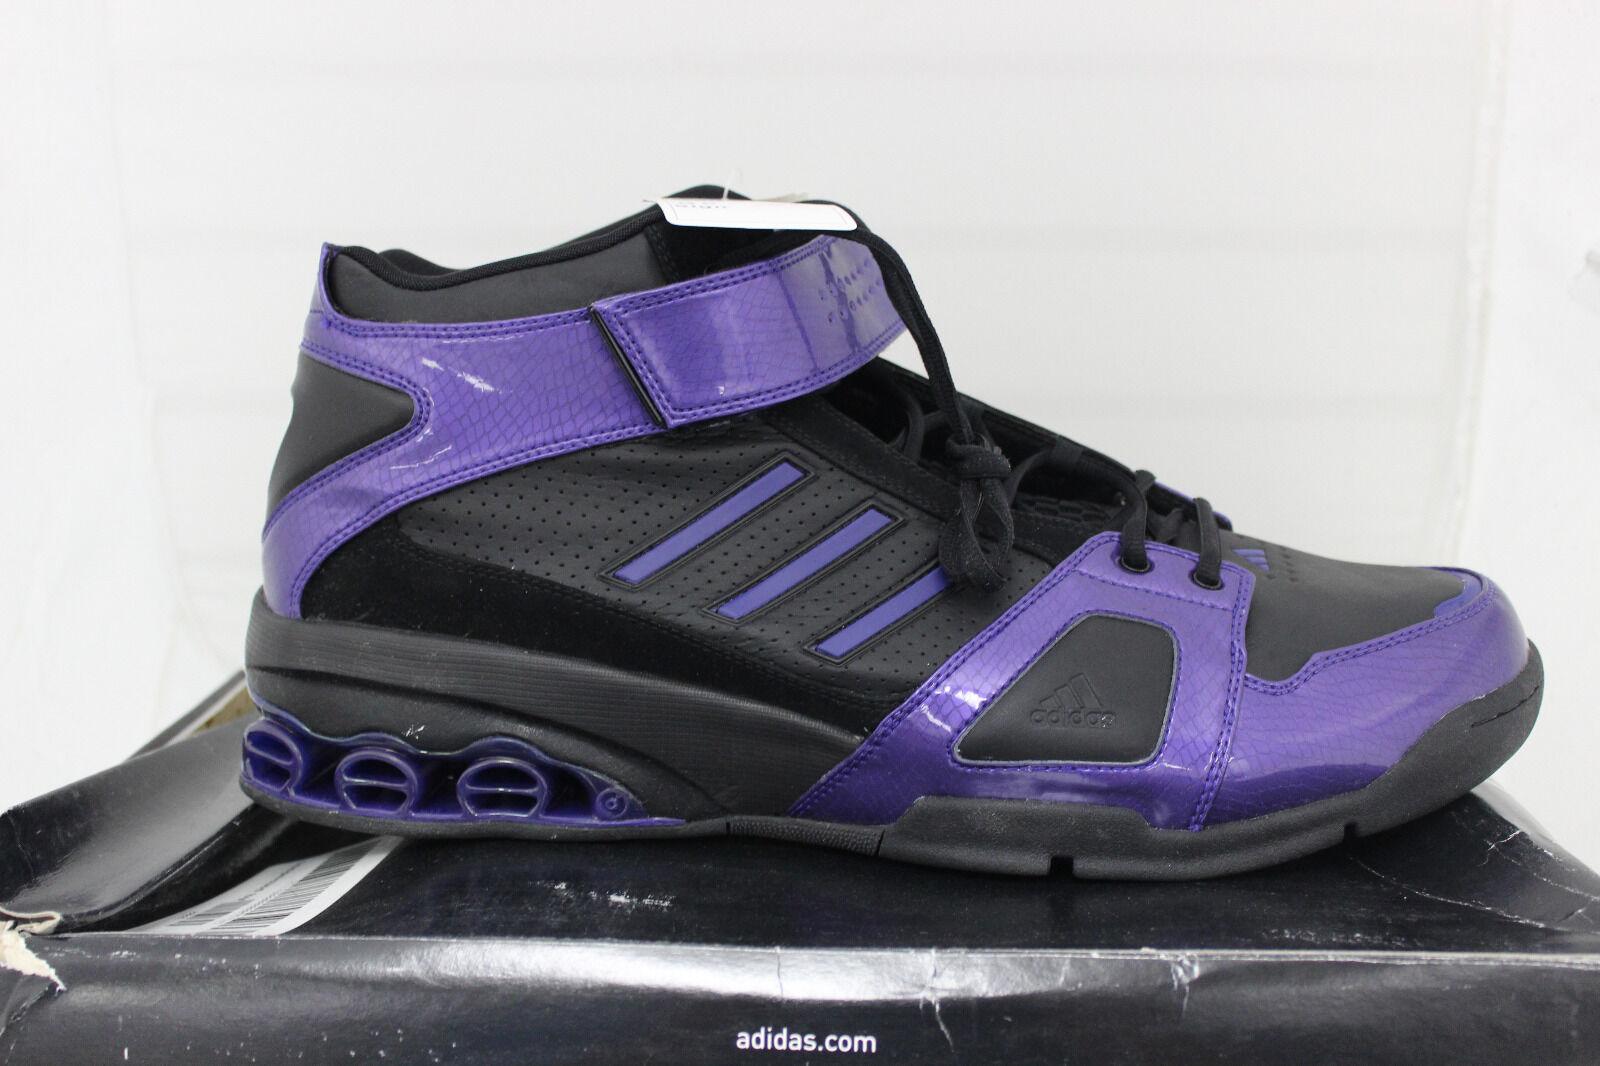 Männer adidas ast nba j-smoov schwarz josh smith basketball - schwarz j-smoov - lila / schwarz 667462 b66455